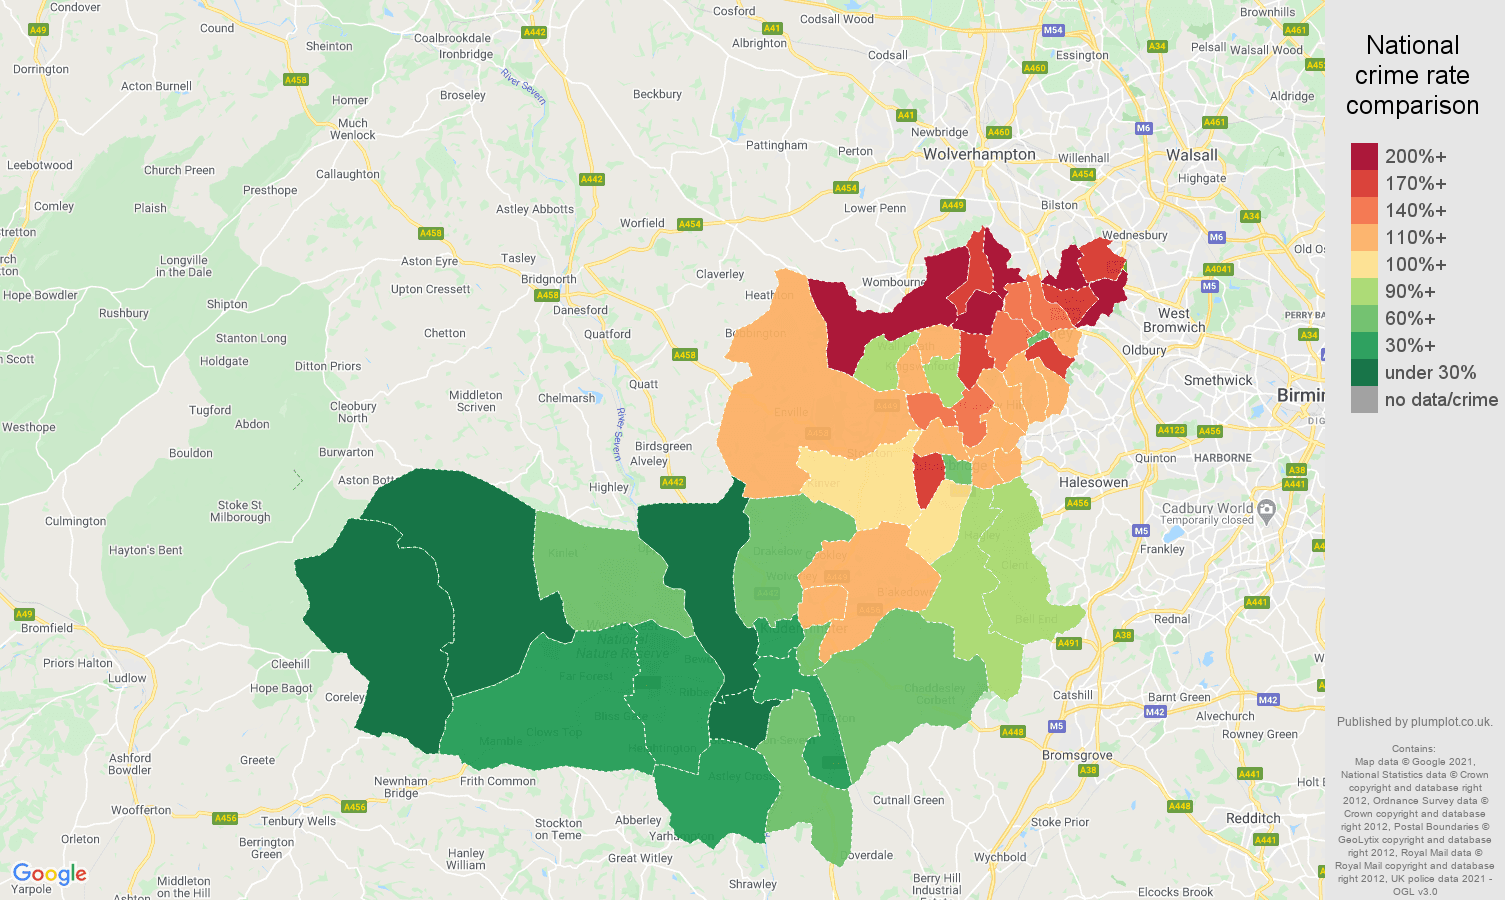 Dudley vehicle crime rate comparison map